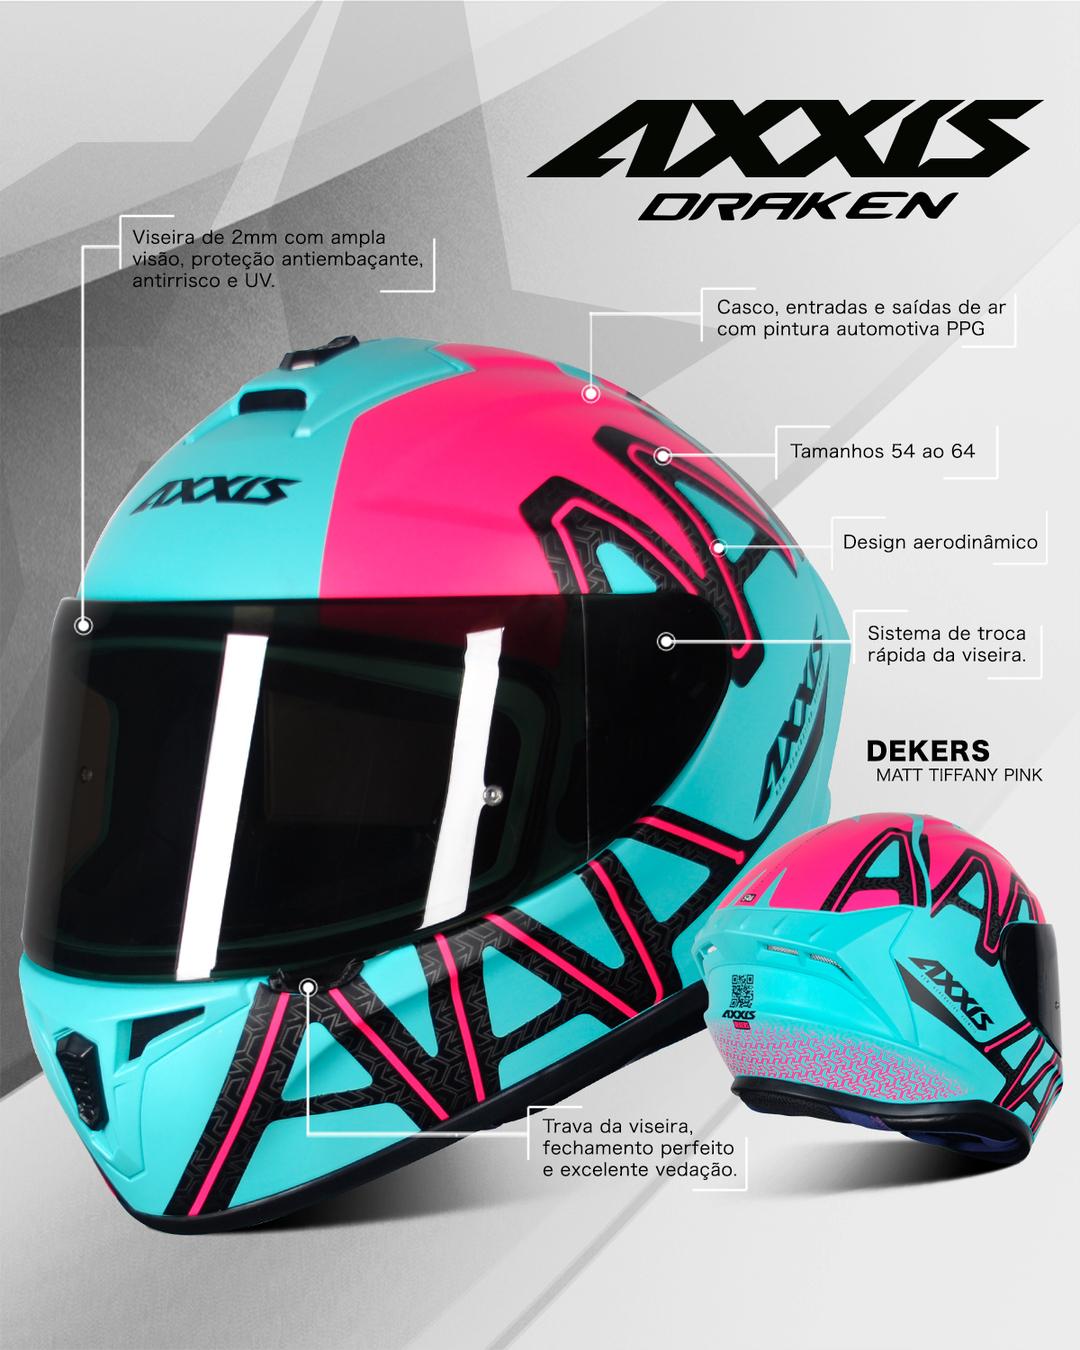 Capacete Axxis Draken Dekers - Tiffany/Rosa/Preto Fosco